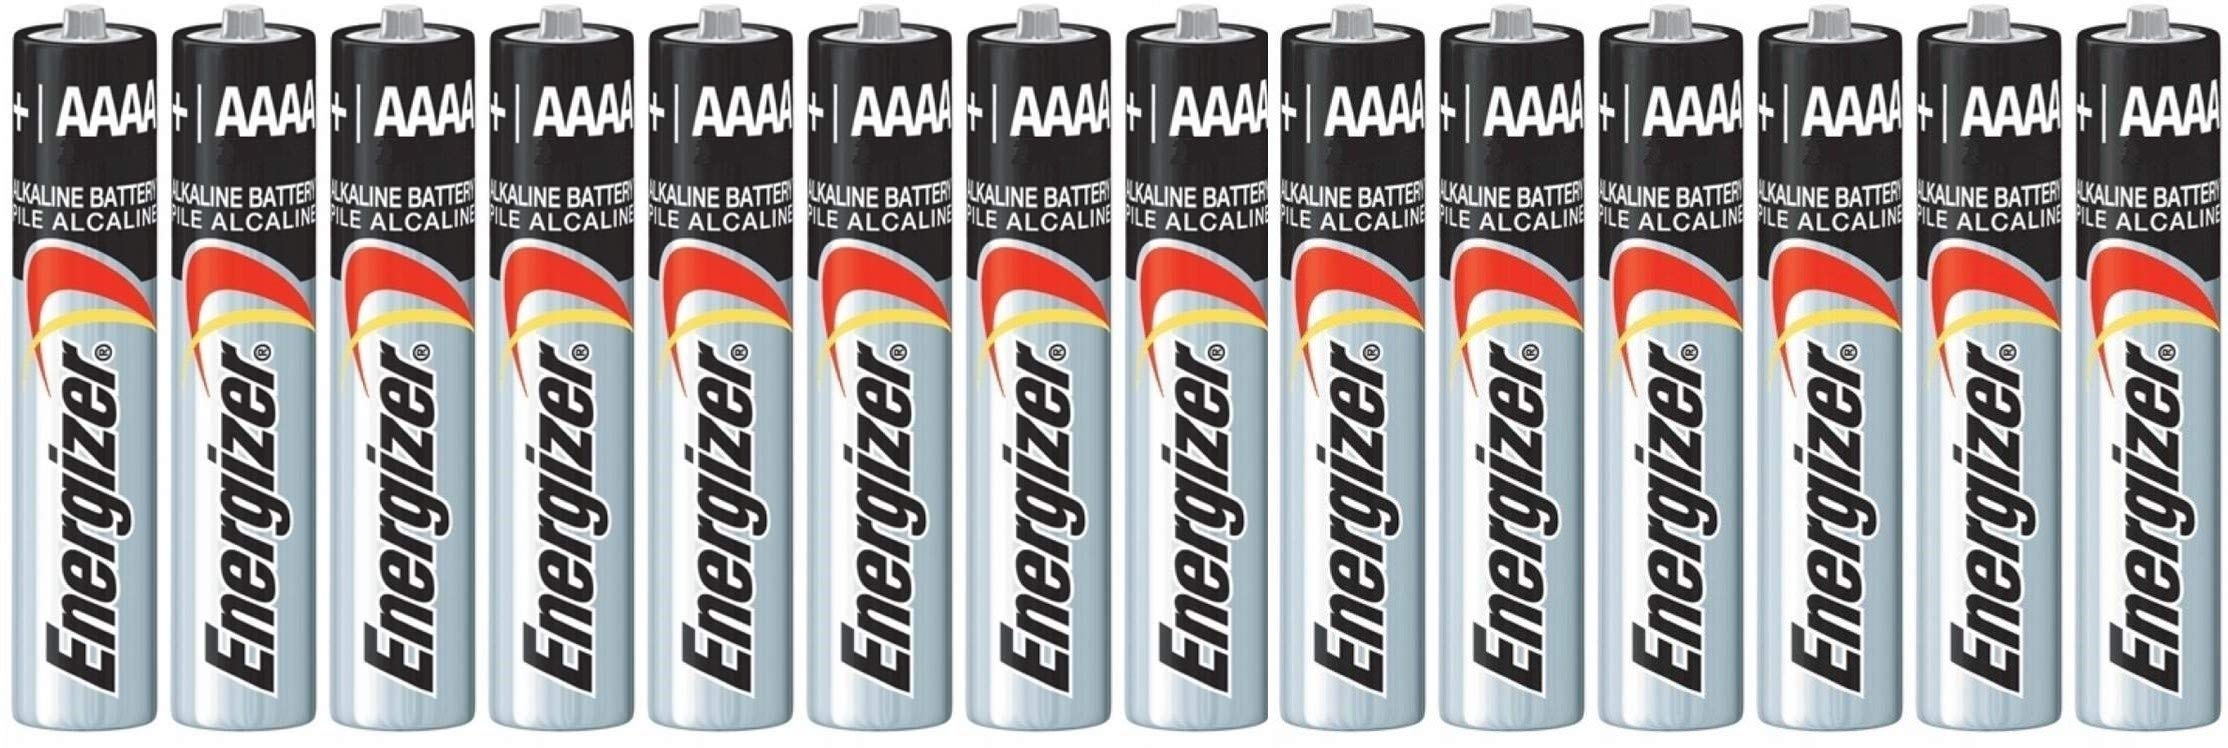 14 Pack of Energizer AAAA Alkaline Batteries. Fits Streamlight Flashlights